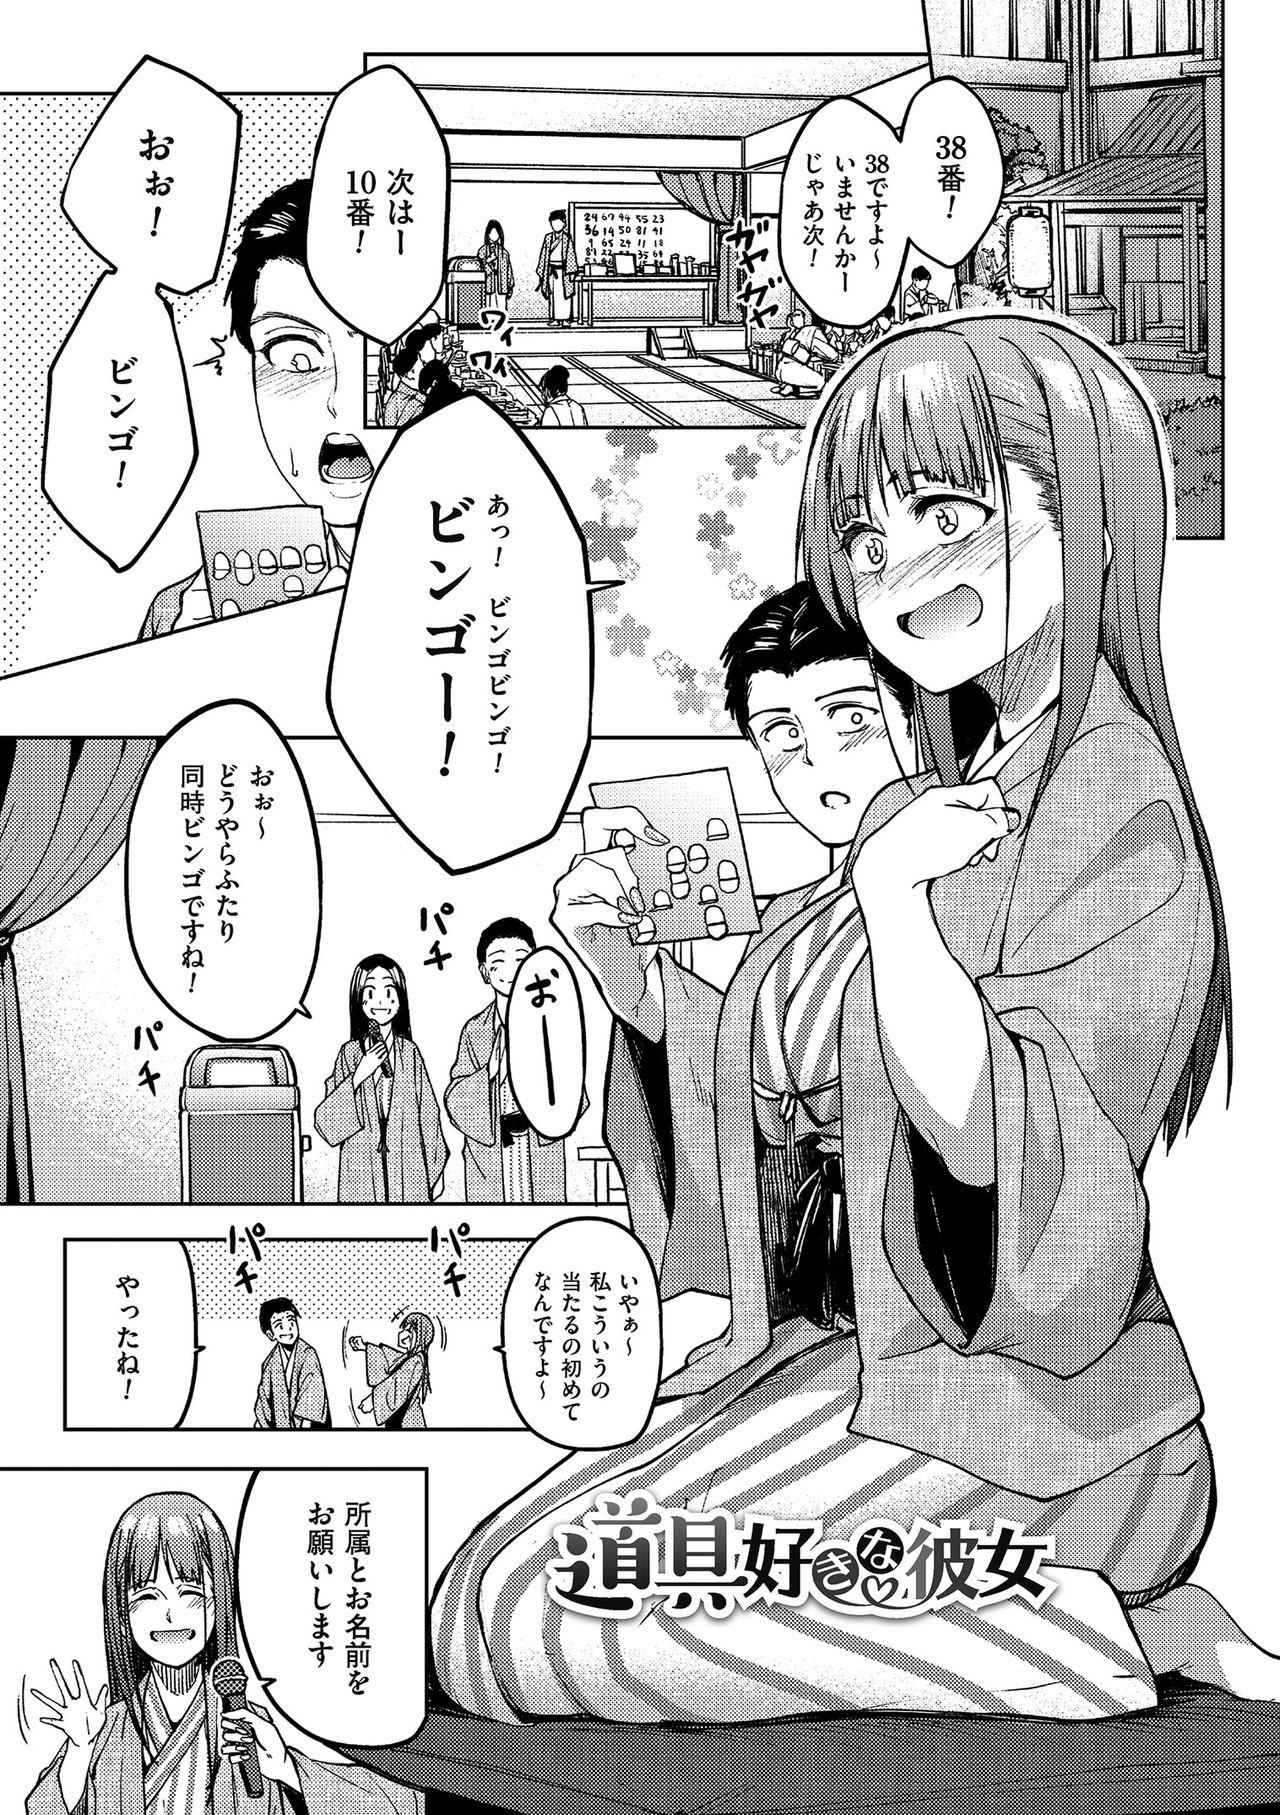 [Kosuke Haruhito] Are-zuki Kanojo - happy sexperience [Digital] 4